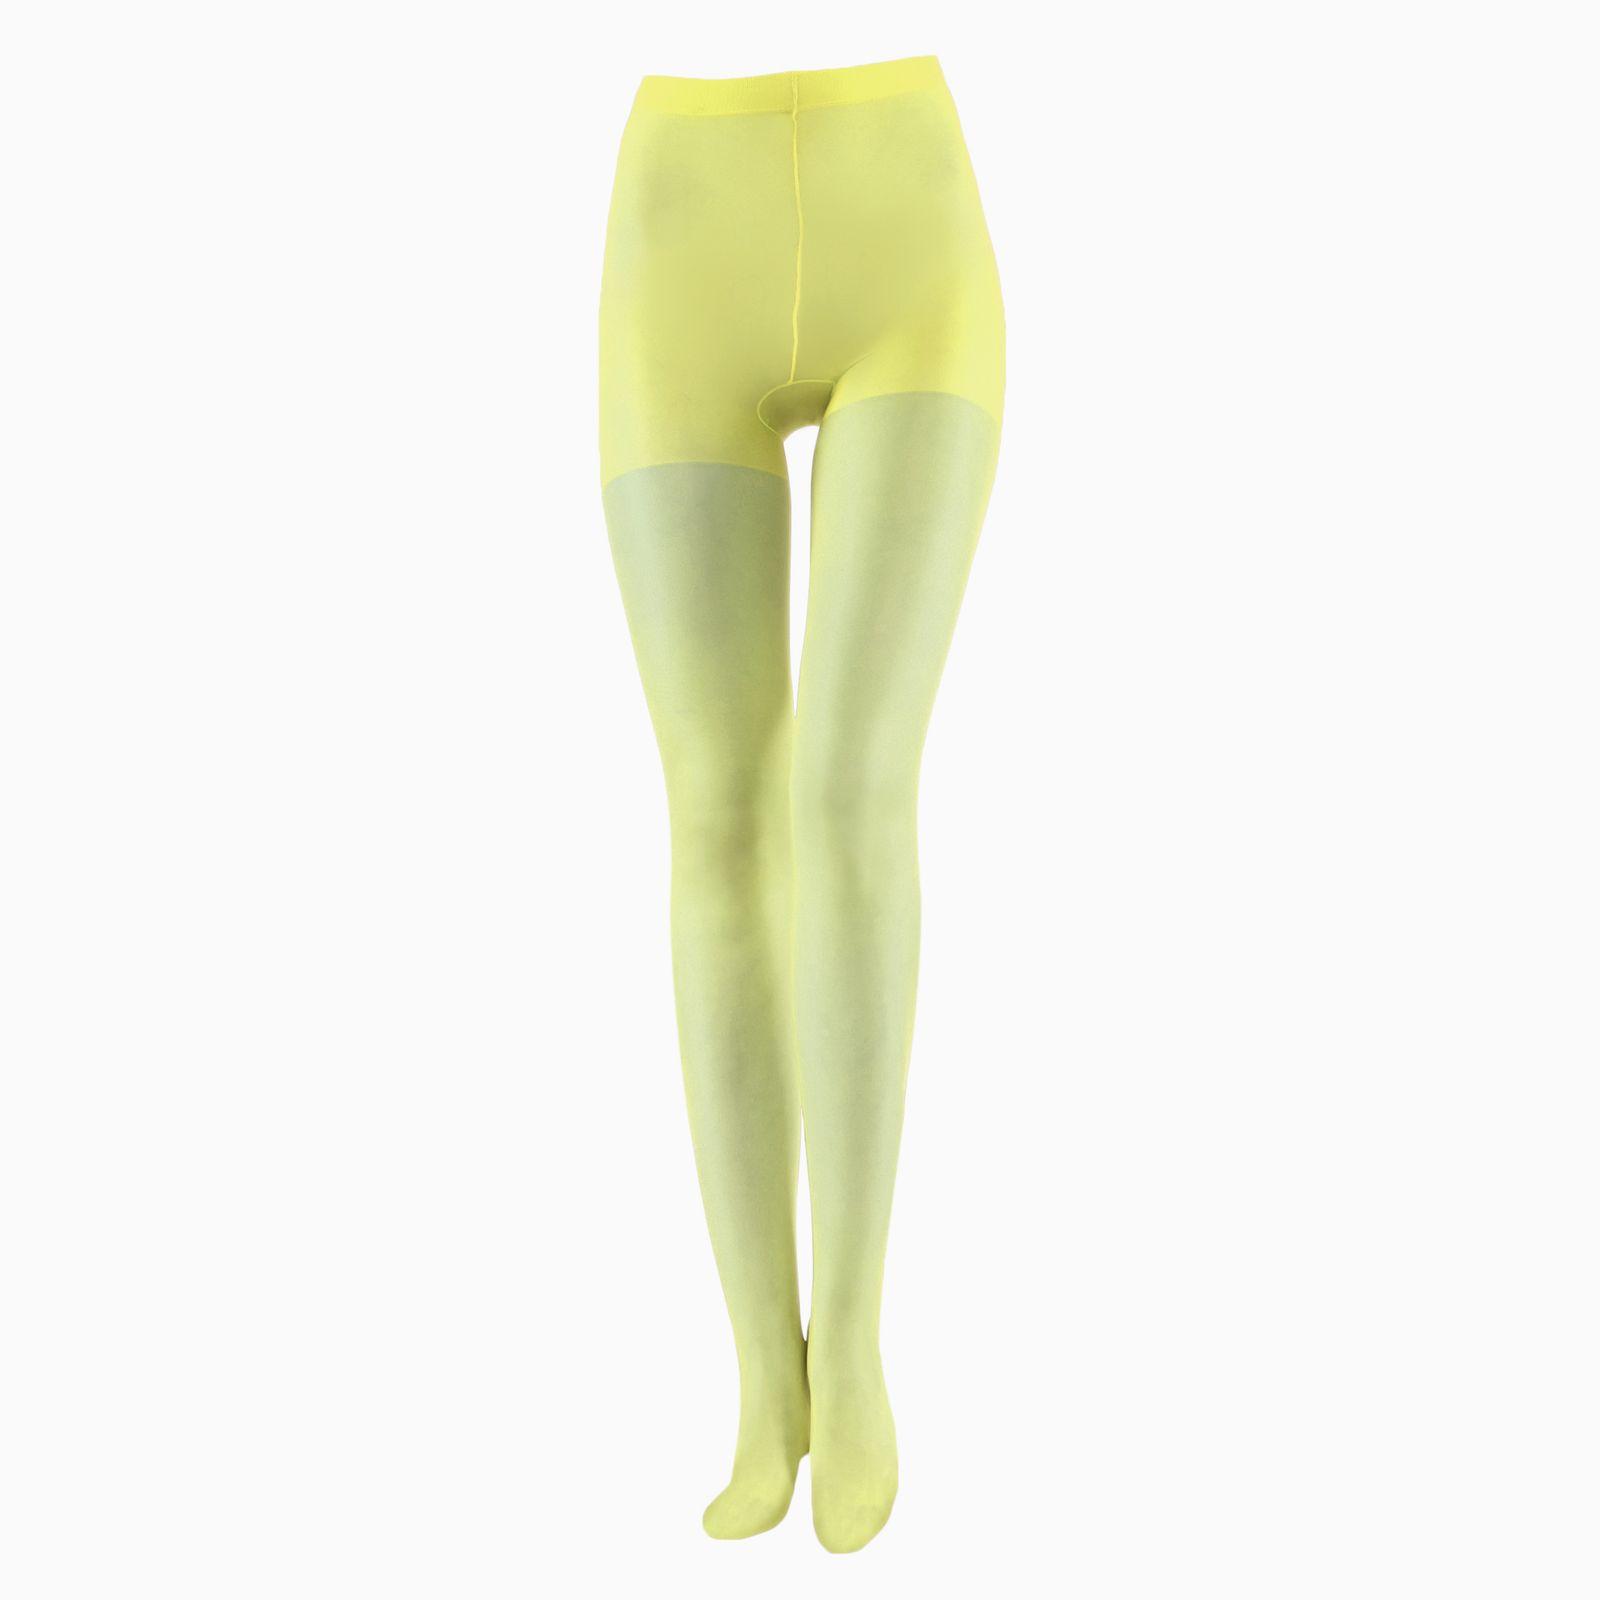 جوراب شلواری زنانه مدل Z106 -  - 2